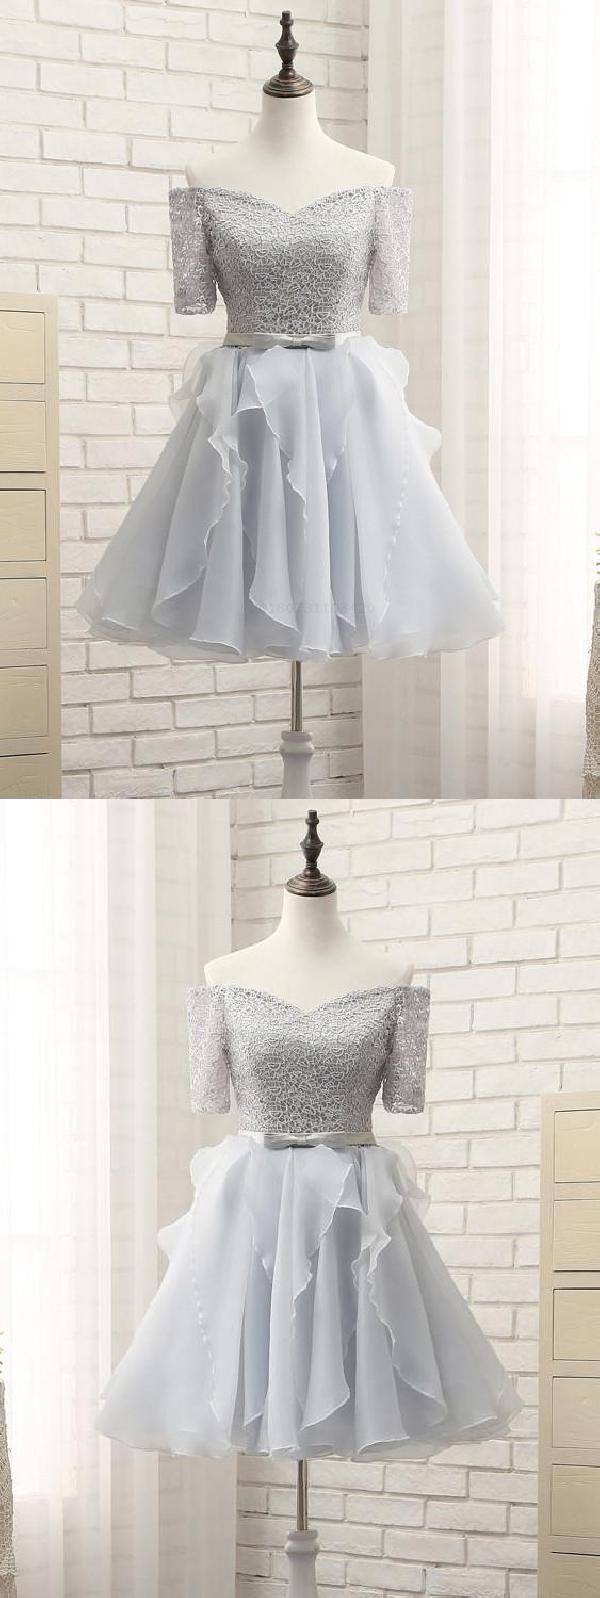 Homecoming dress short prom dresses silver homecoming dress